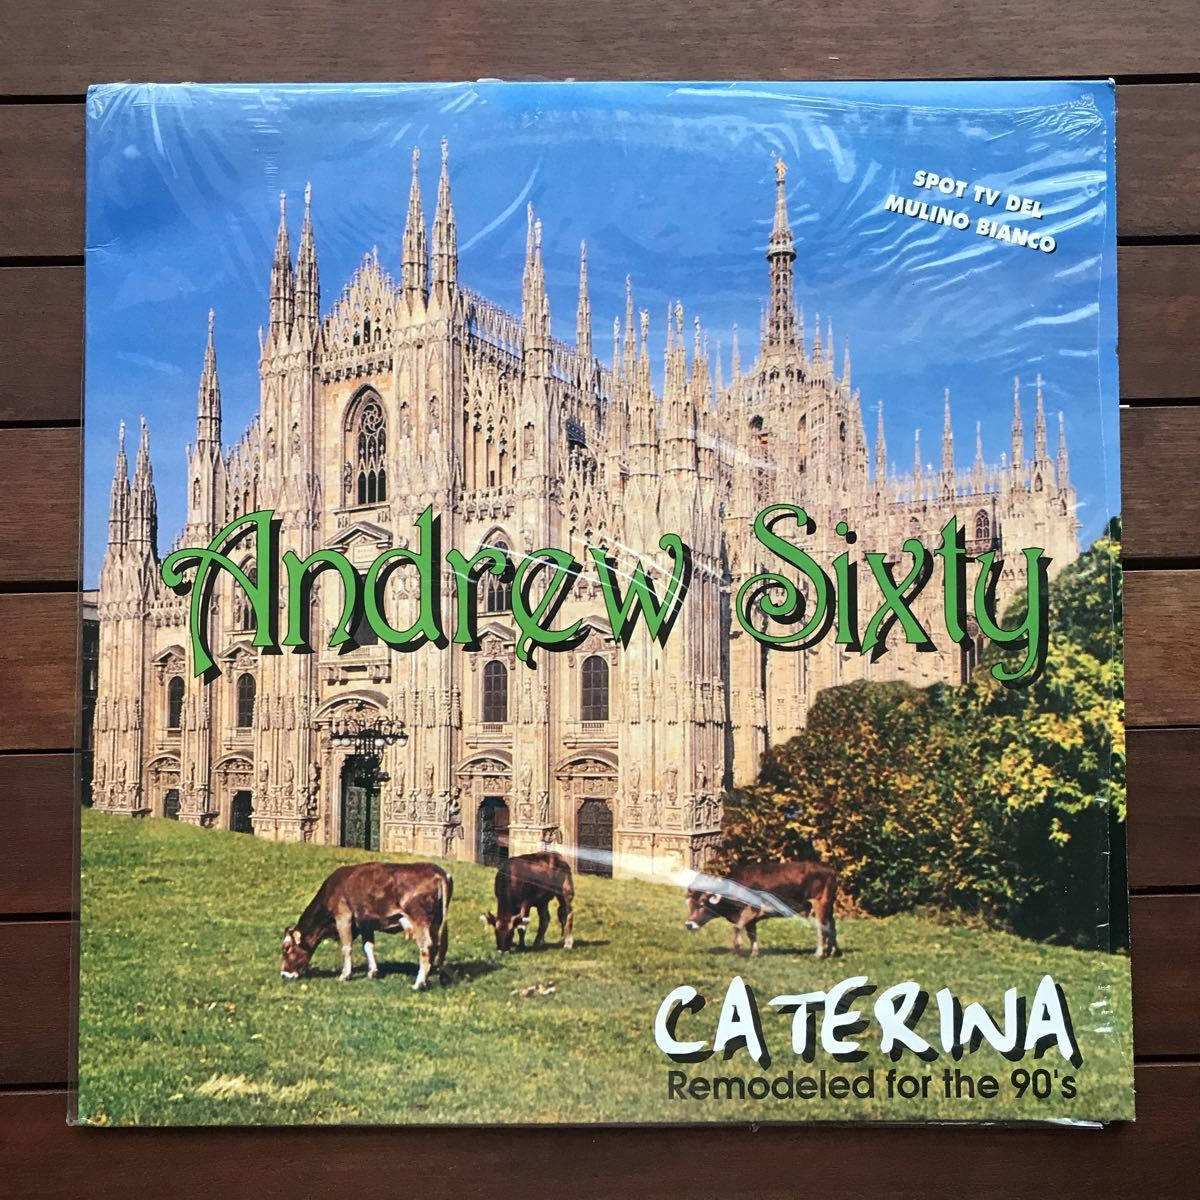 【r&b】Andrew Sixty / Caterina[12inch]オリジナル盤《9595》《1-2》